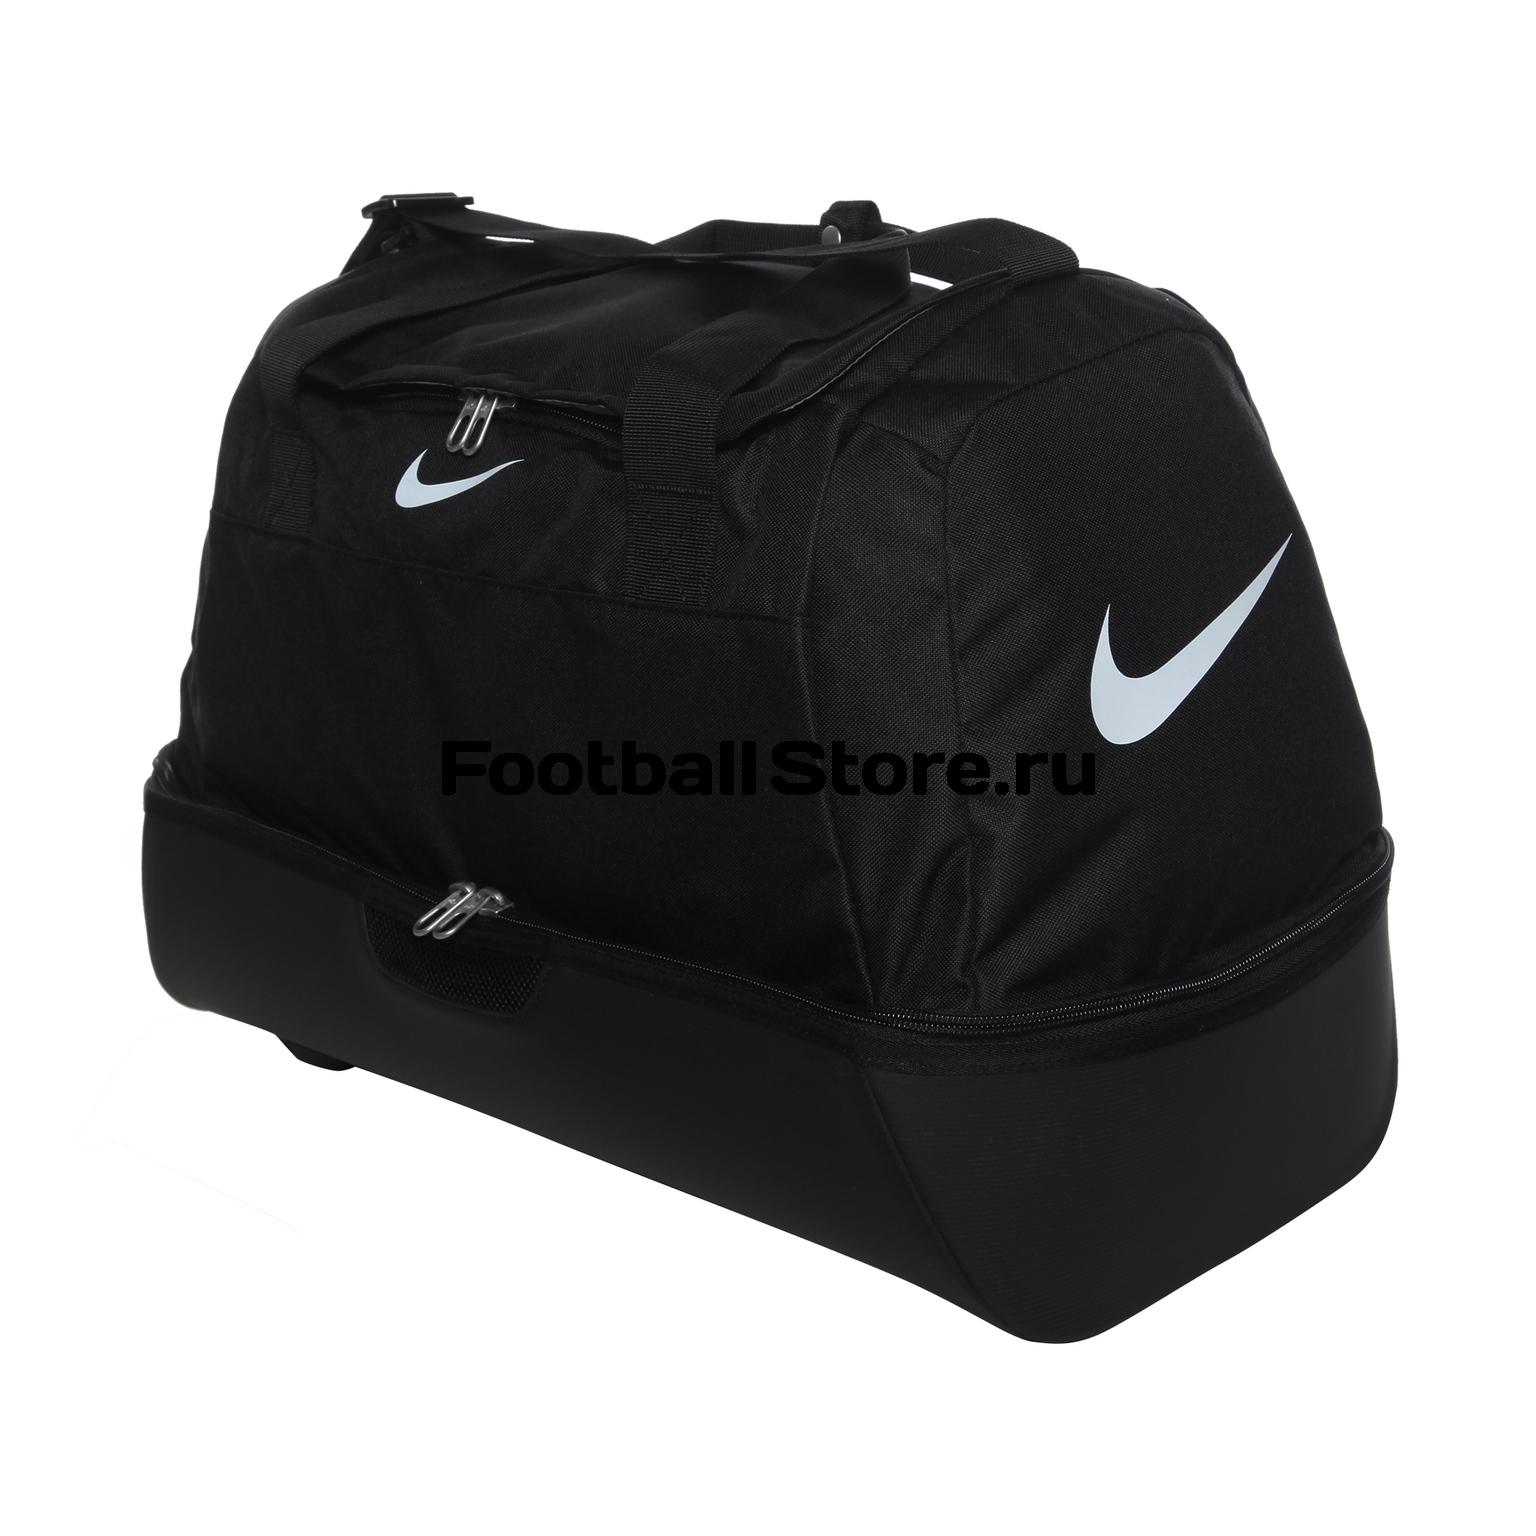 Сумки/Рюкзаки Nike Сумка Nike Club Team M BA5196-010